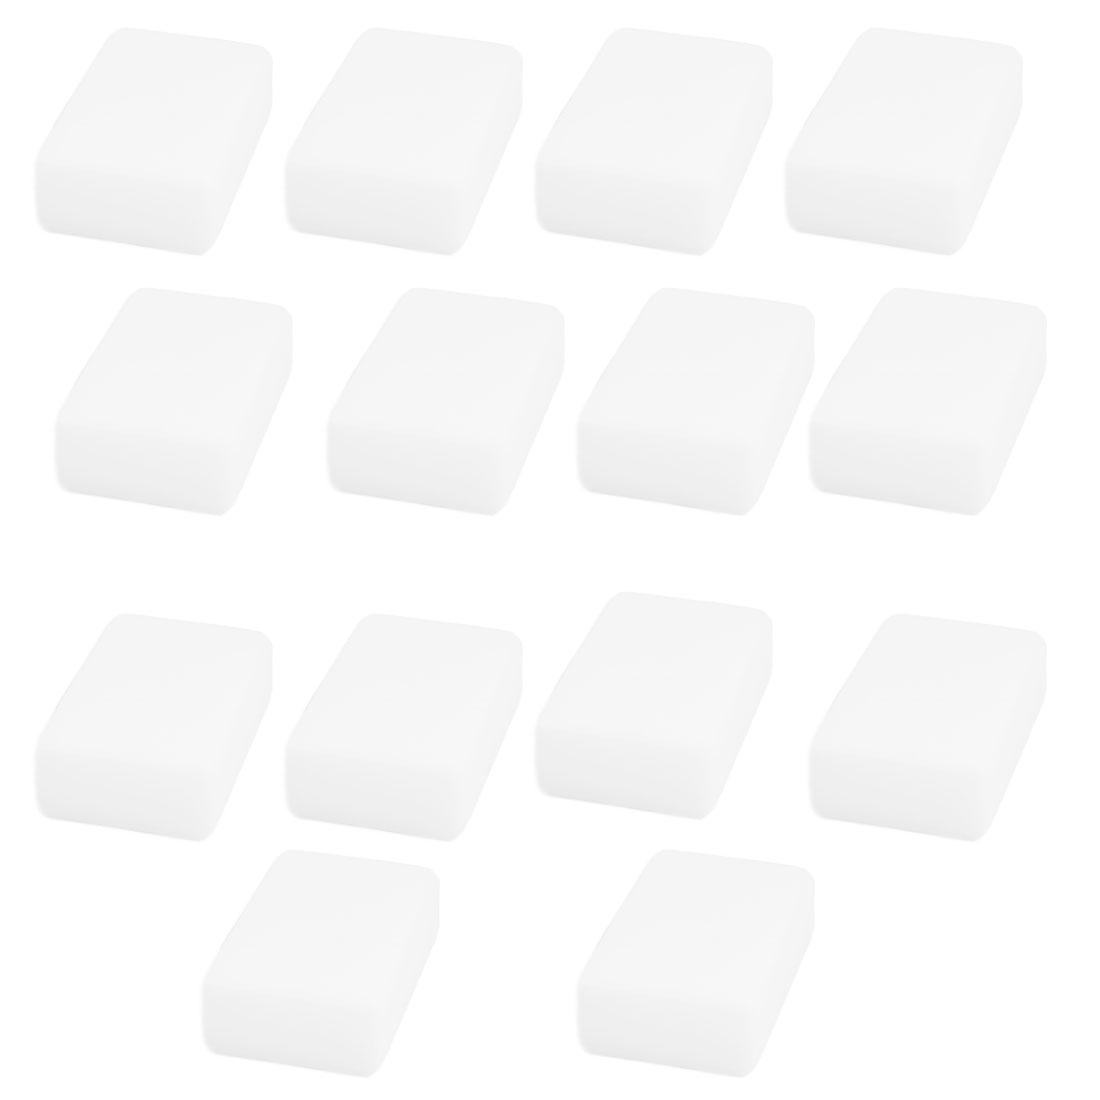 Household Kitchen Sponge Rectangle Pot Pan Plate Bowl Cleaning Pad White 14pcs